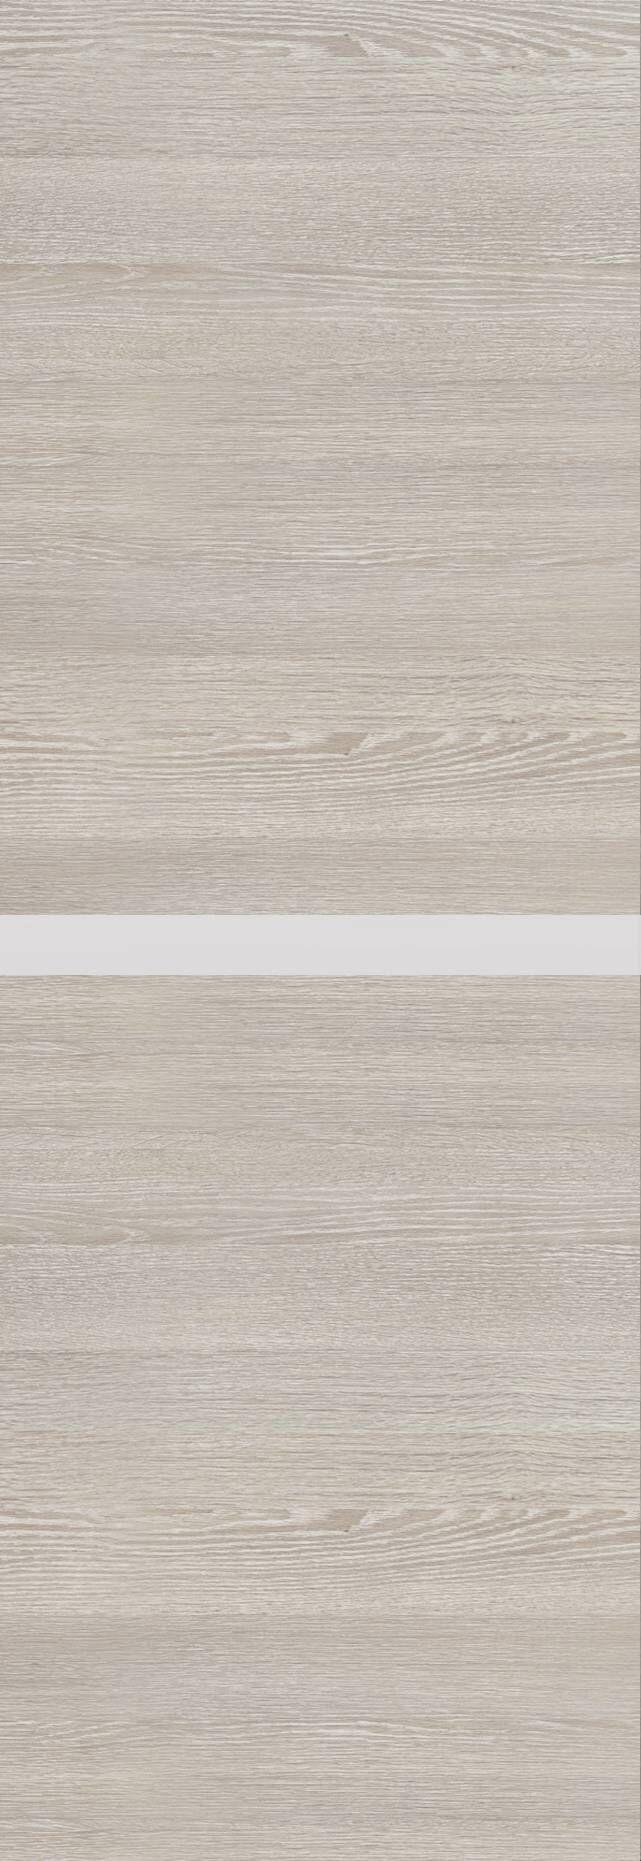 Tivoli Б-4 Invisible цвет - Серый дуб Без стекла (ДГ)